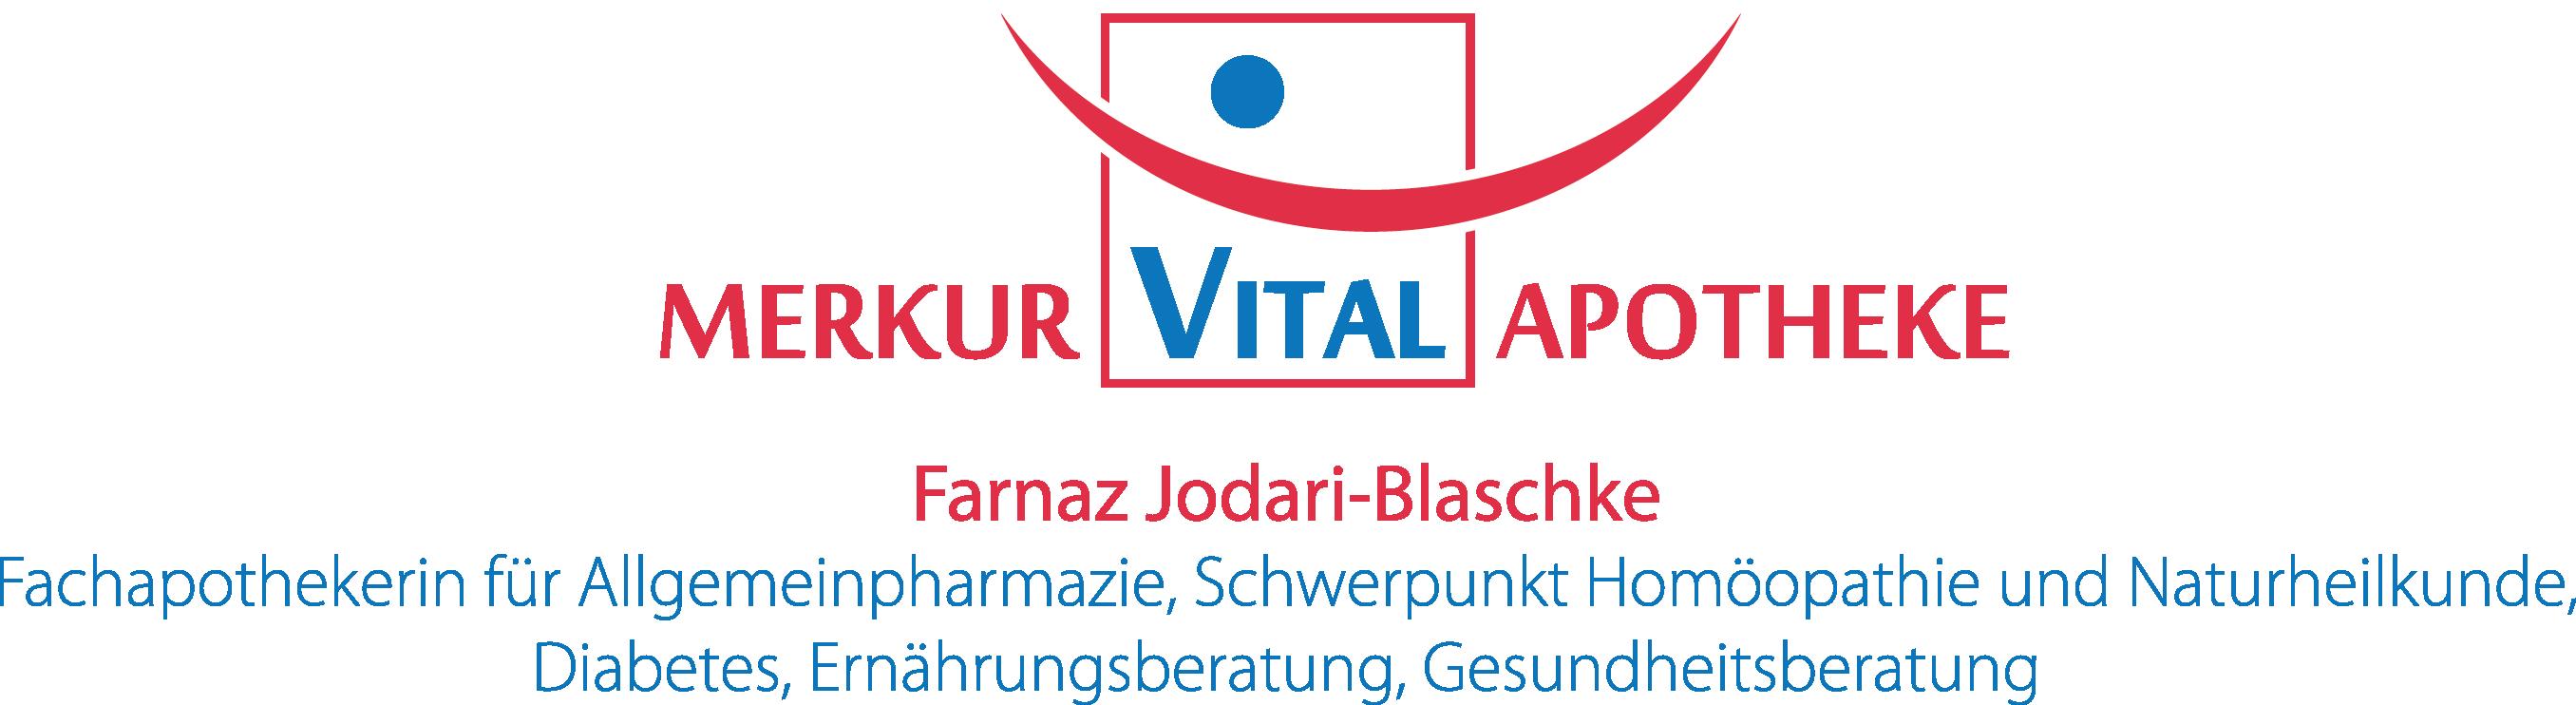 Logo der Merkur Vital Apotheke